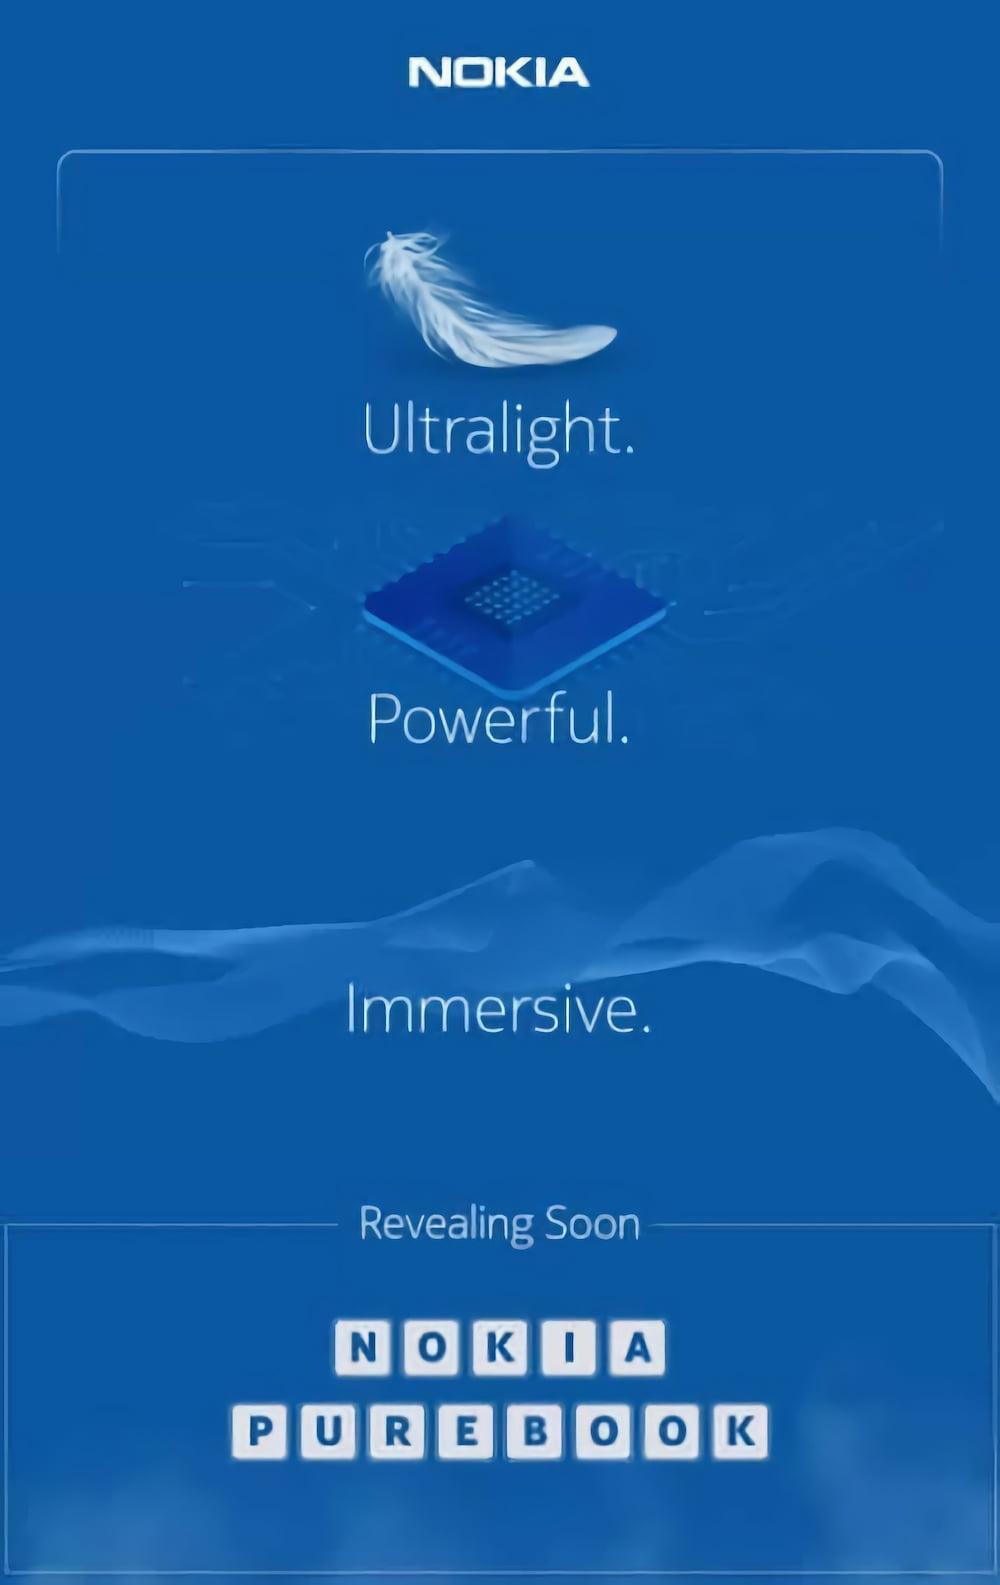 Nokia Purebook